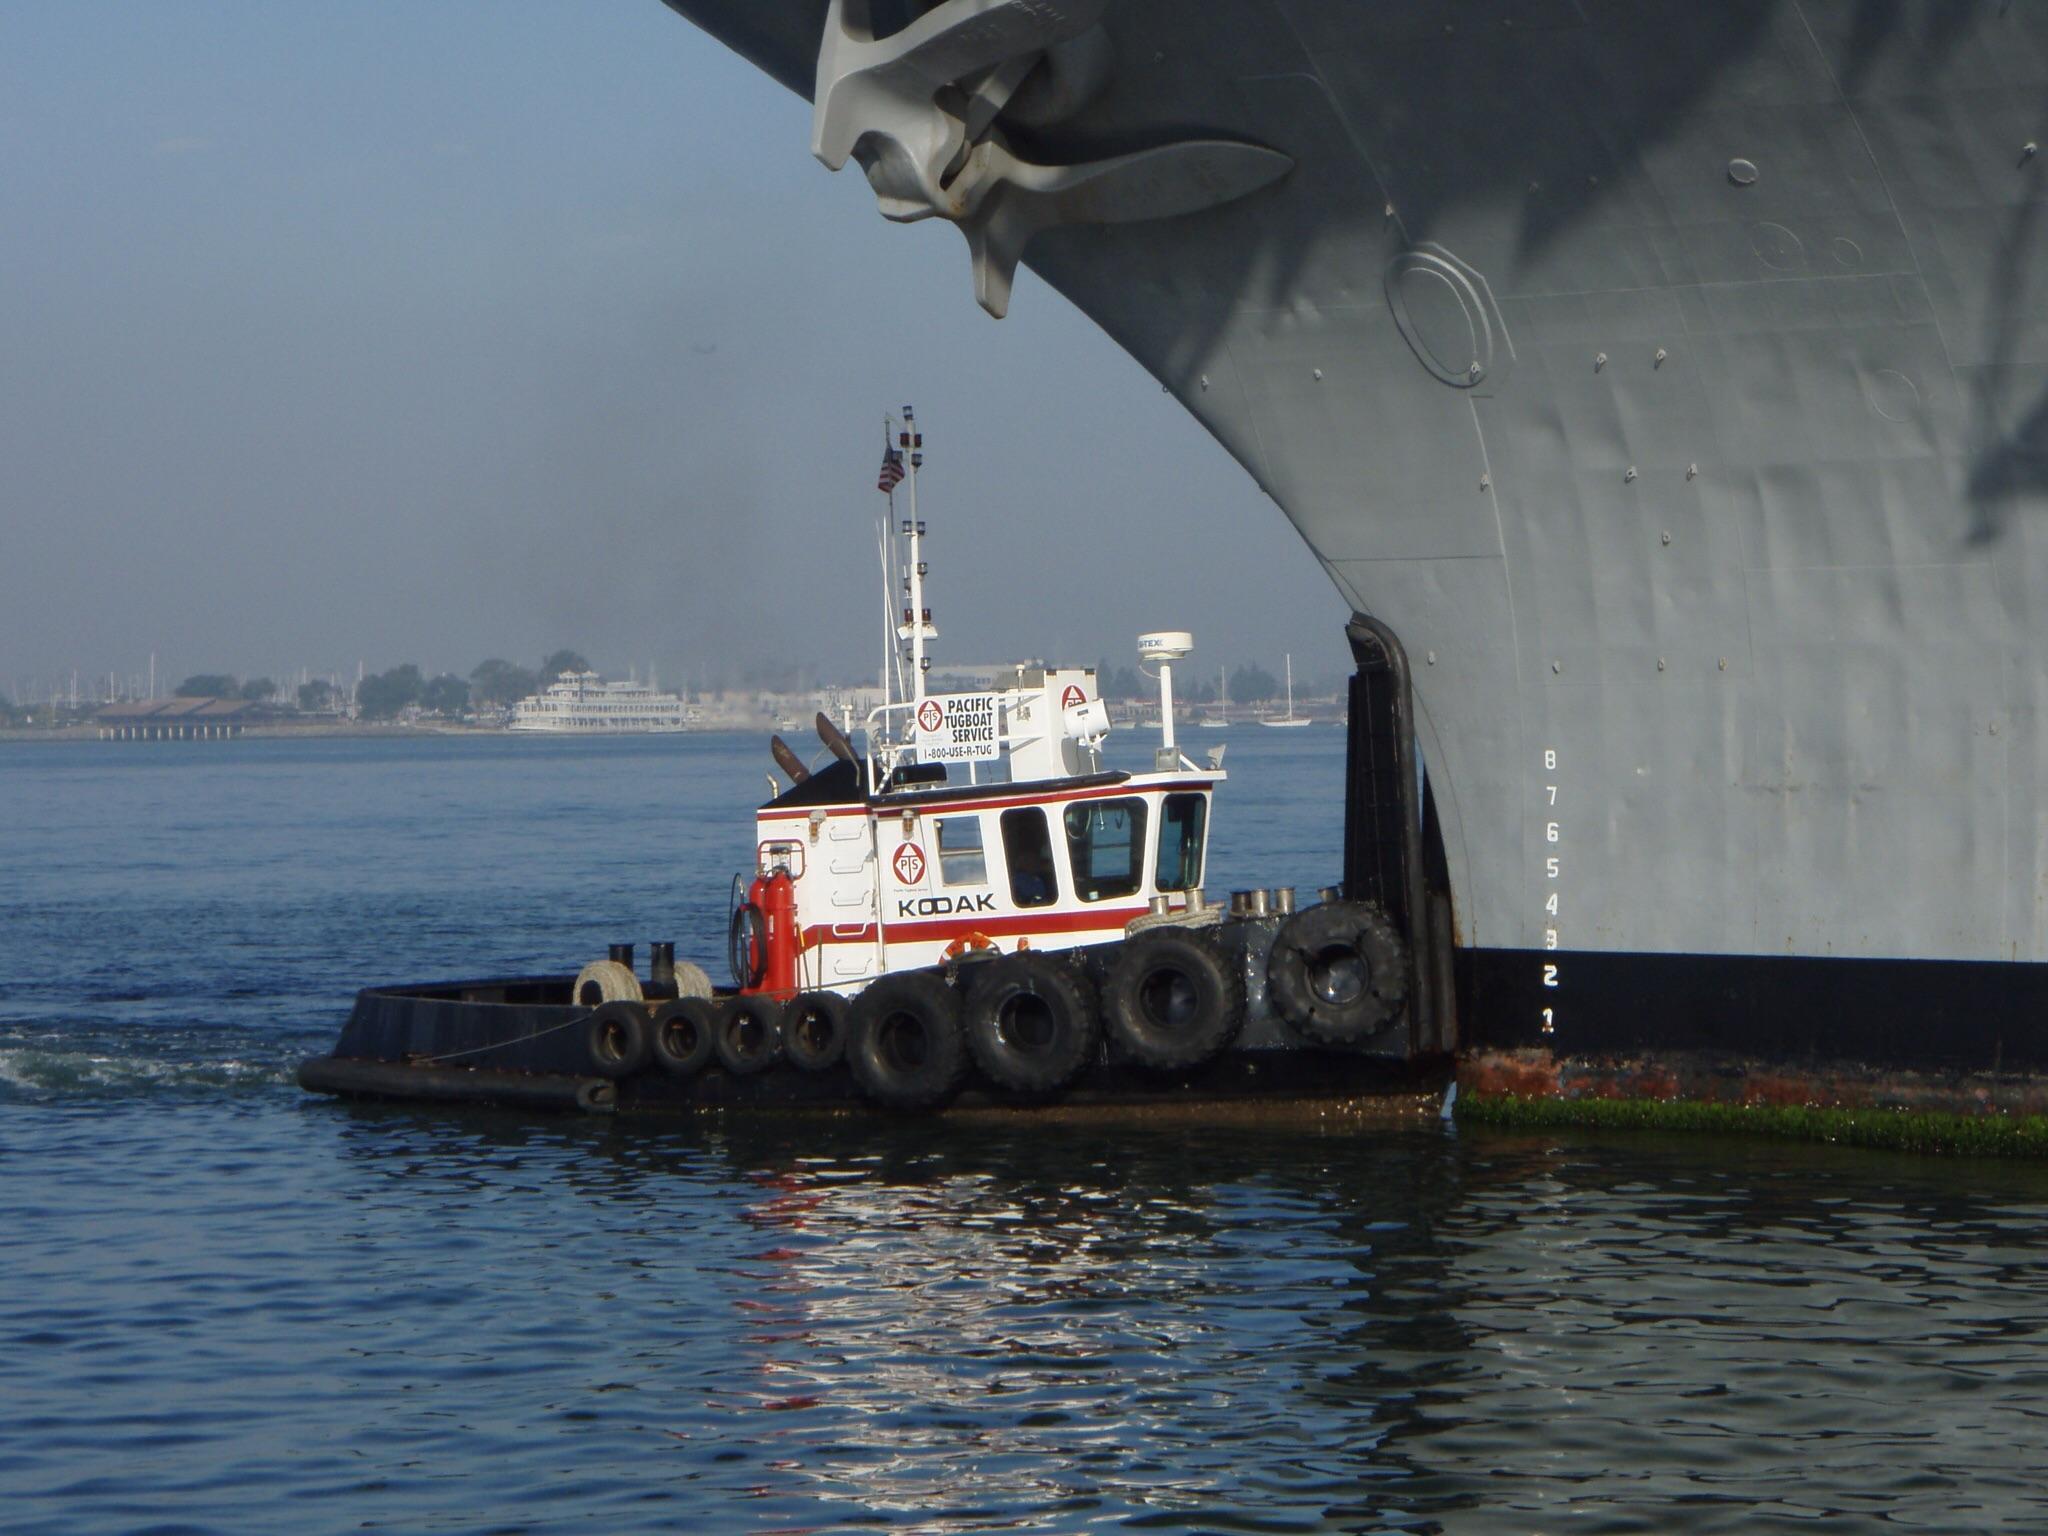 Commercial Boat Tug. Boat